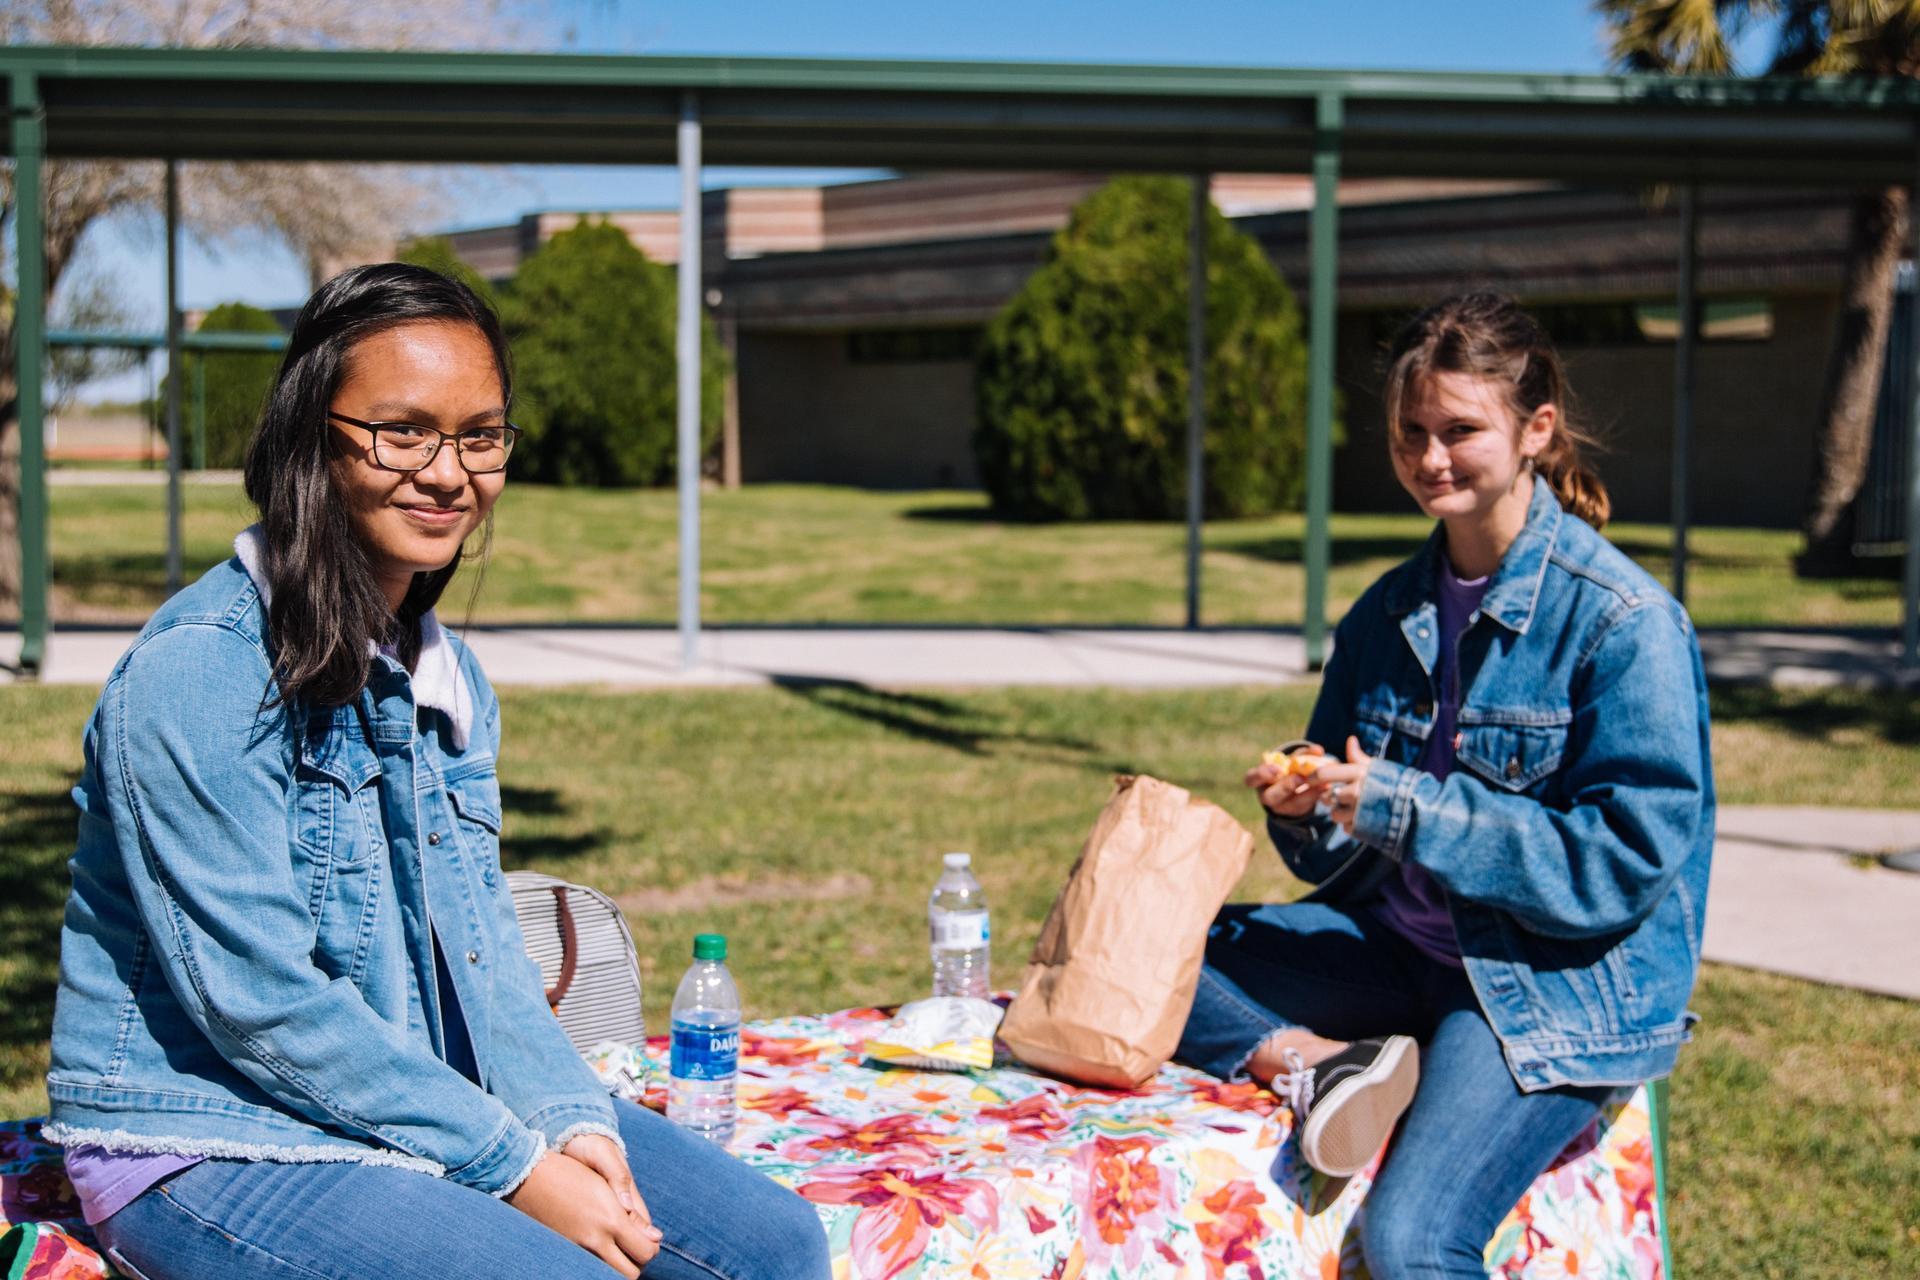 girls eating school lunch outside